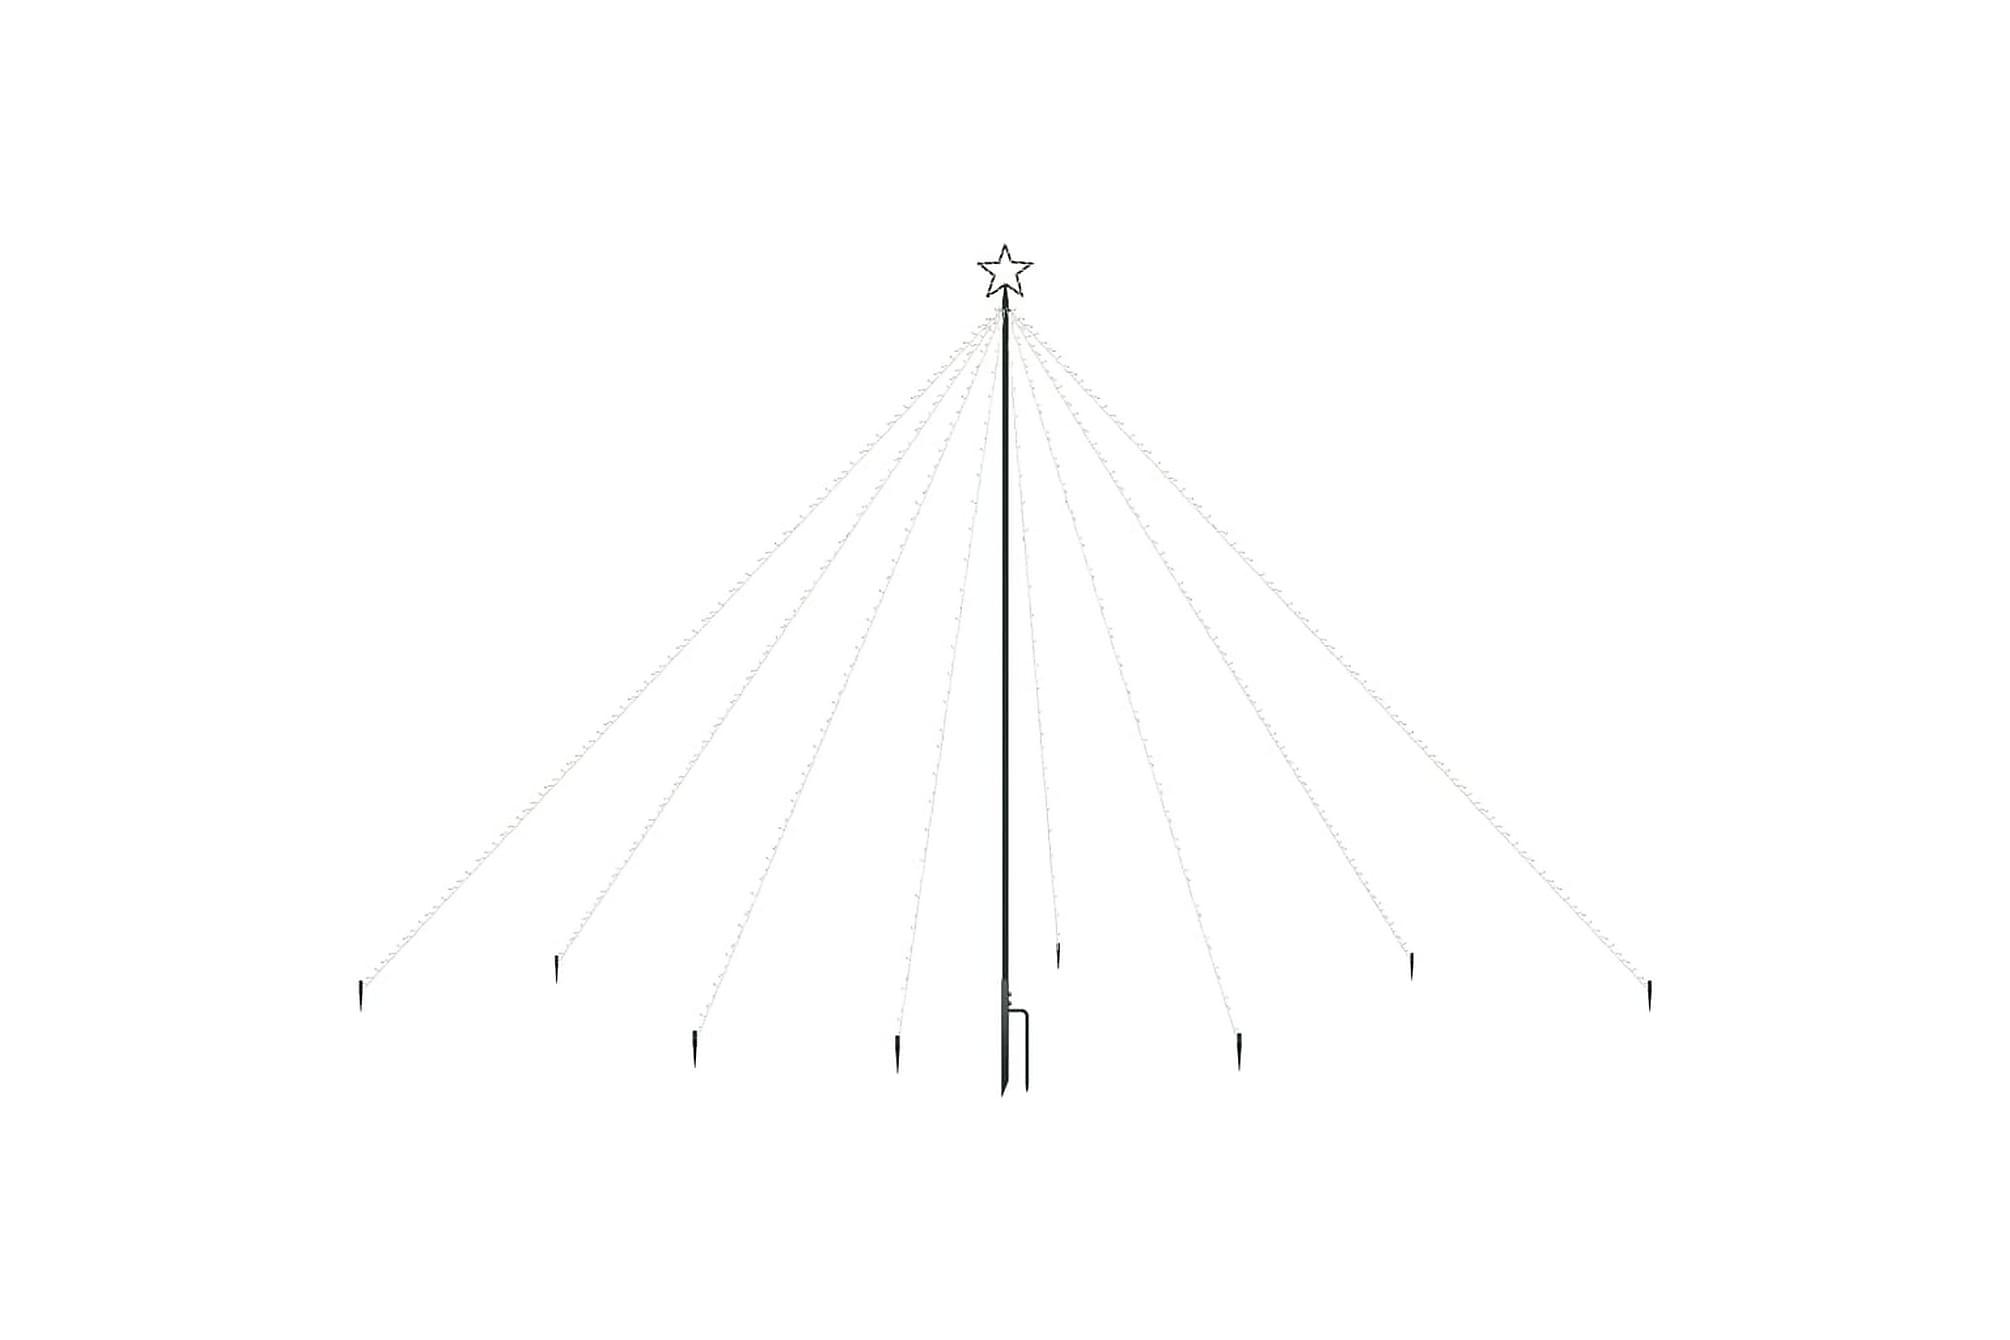 Julgran LED inomhus/utomhus 576 lysdioder 3,6 m, Julpynt & juldekoration